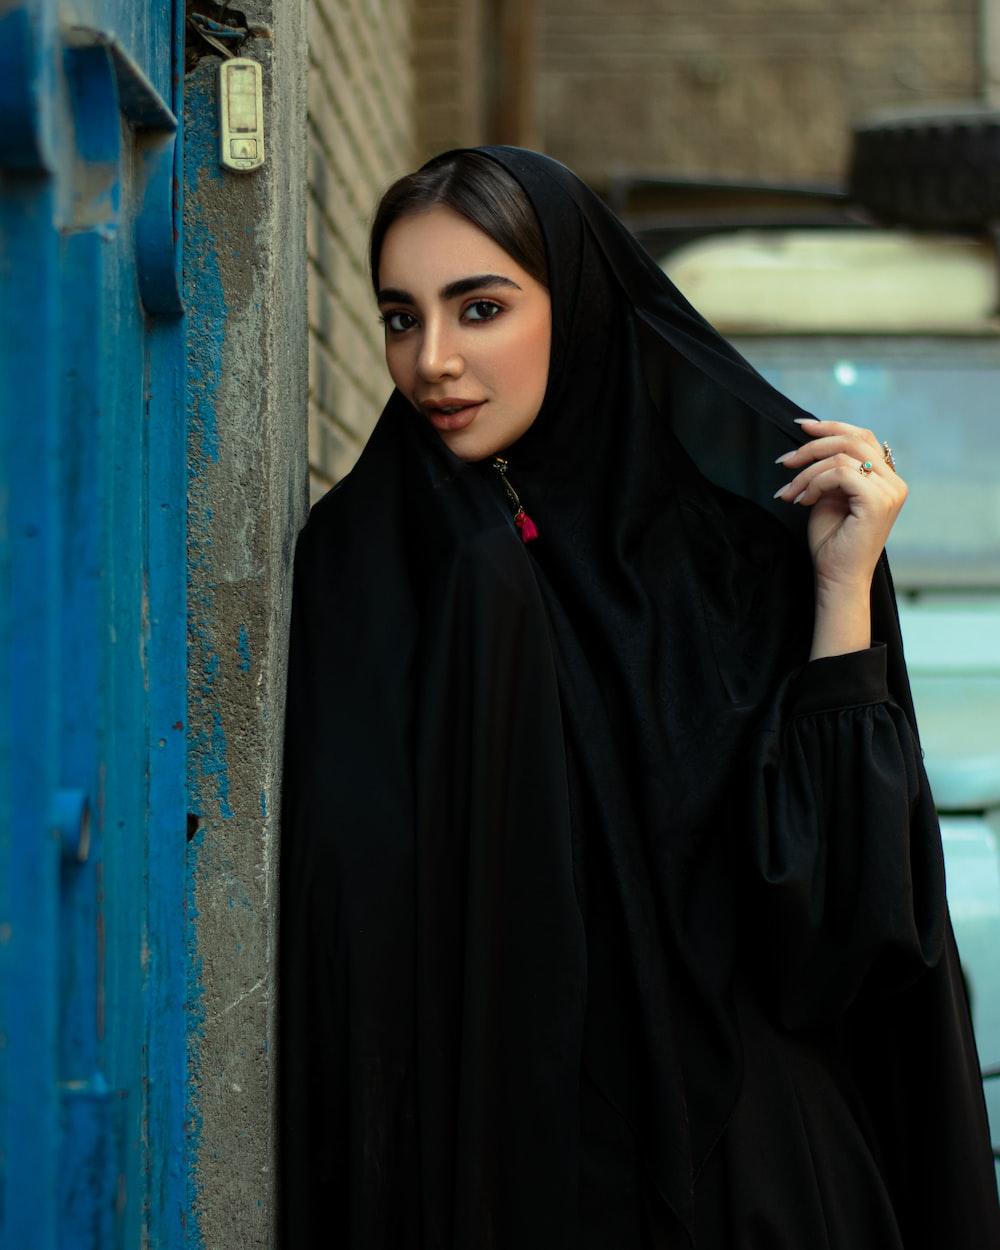 woman in black hijab standing beside blue wall